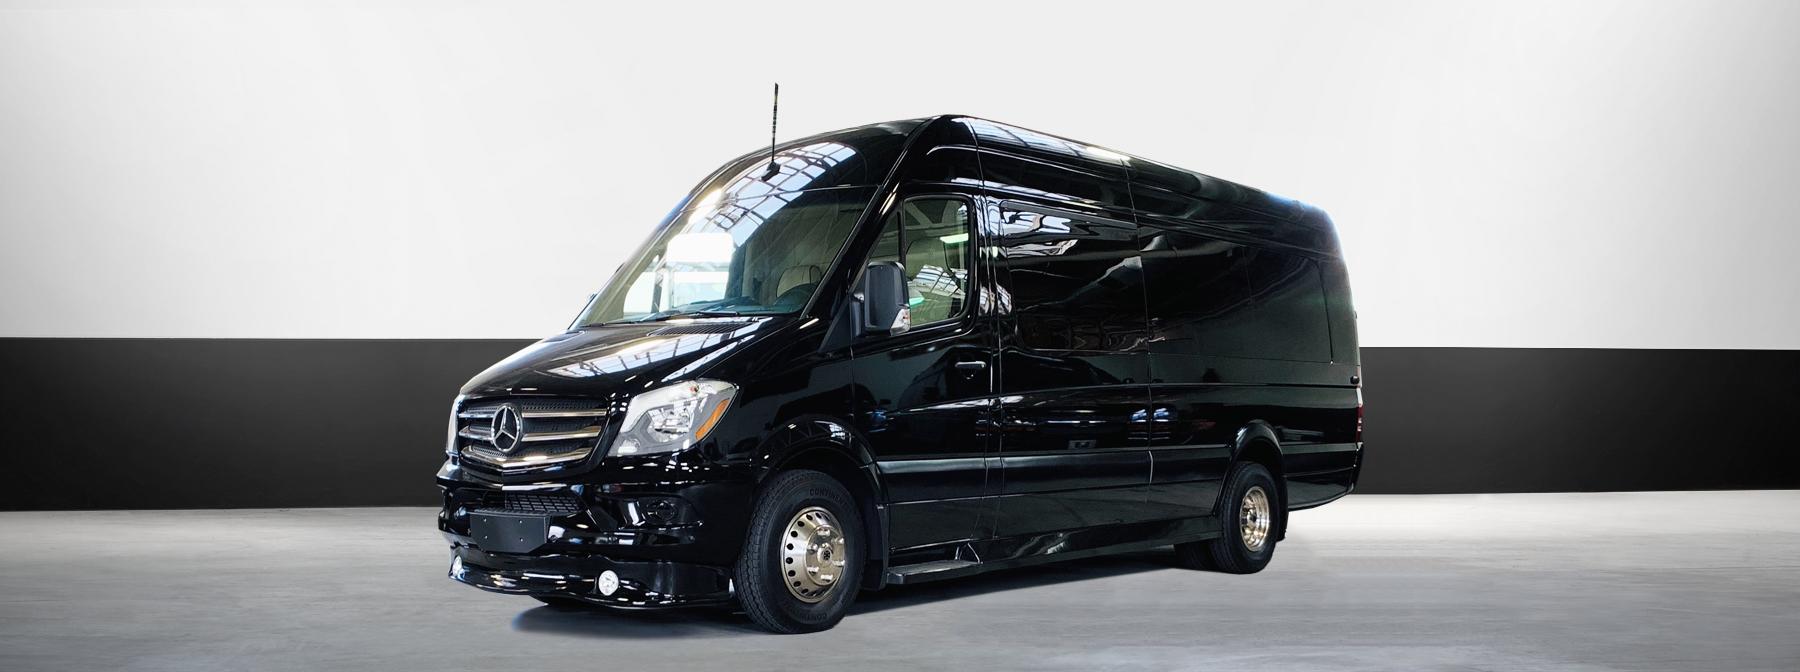 Mercedes Sprinter luxury car rental in black